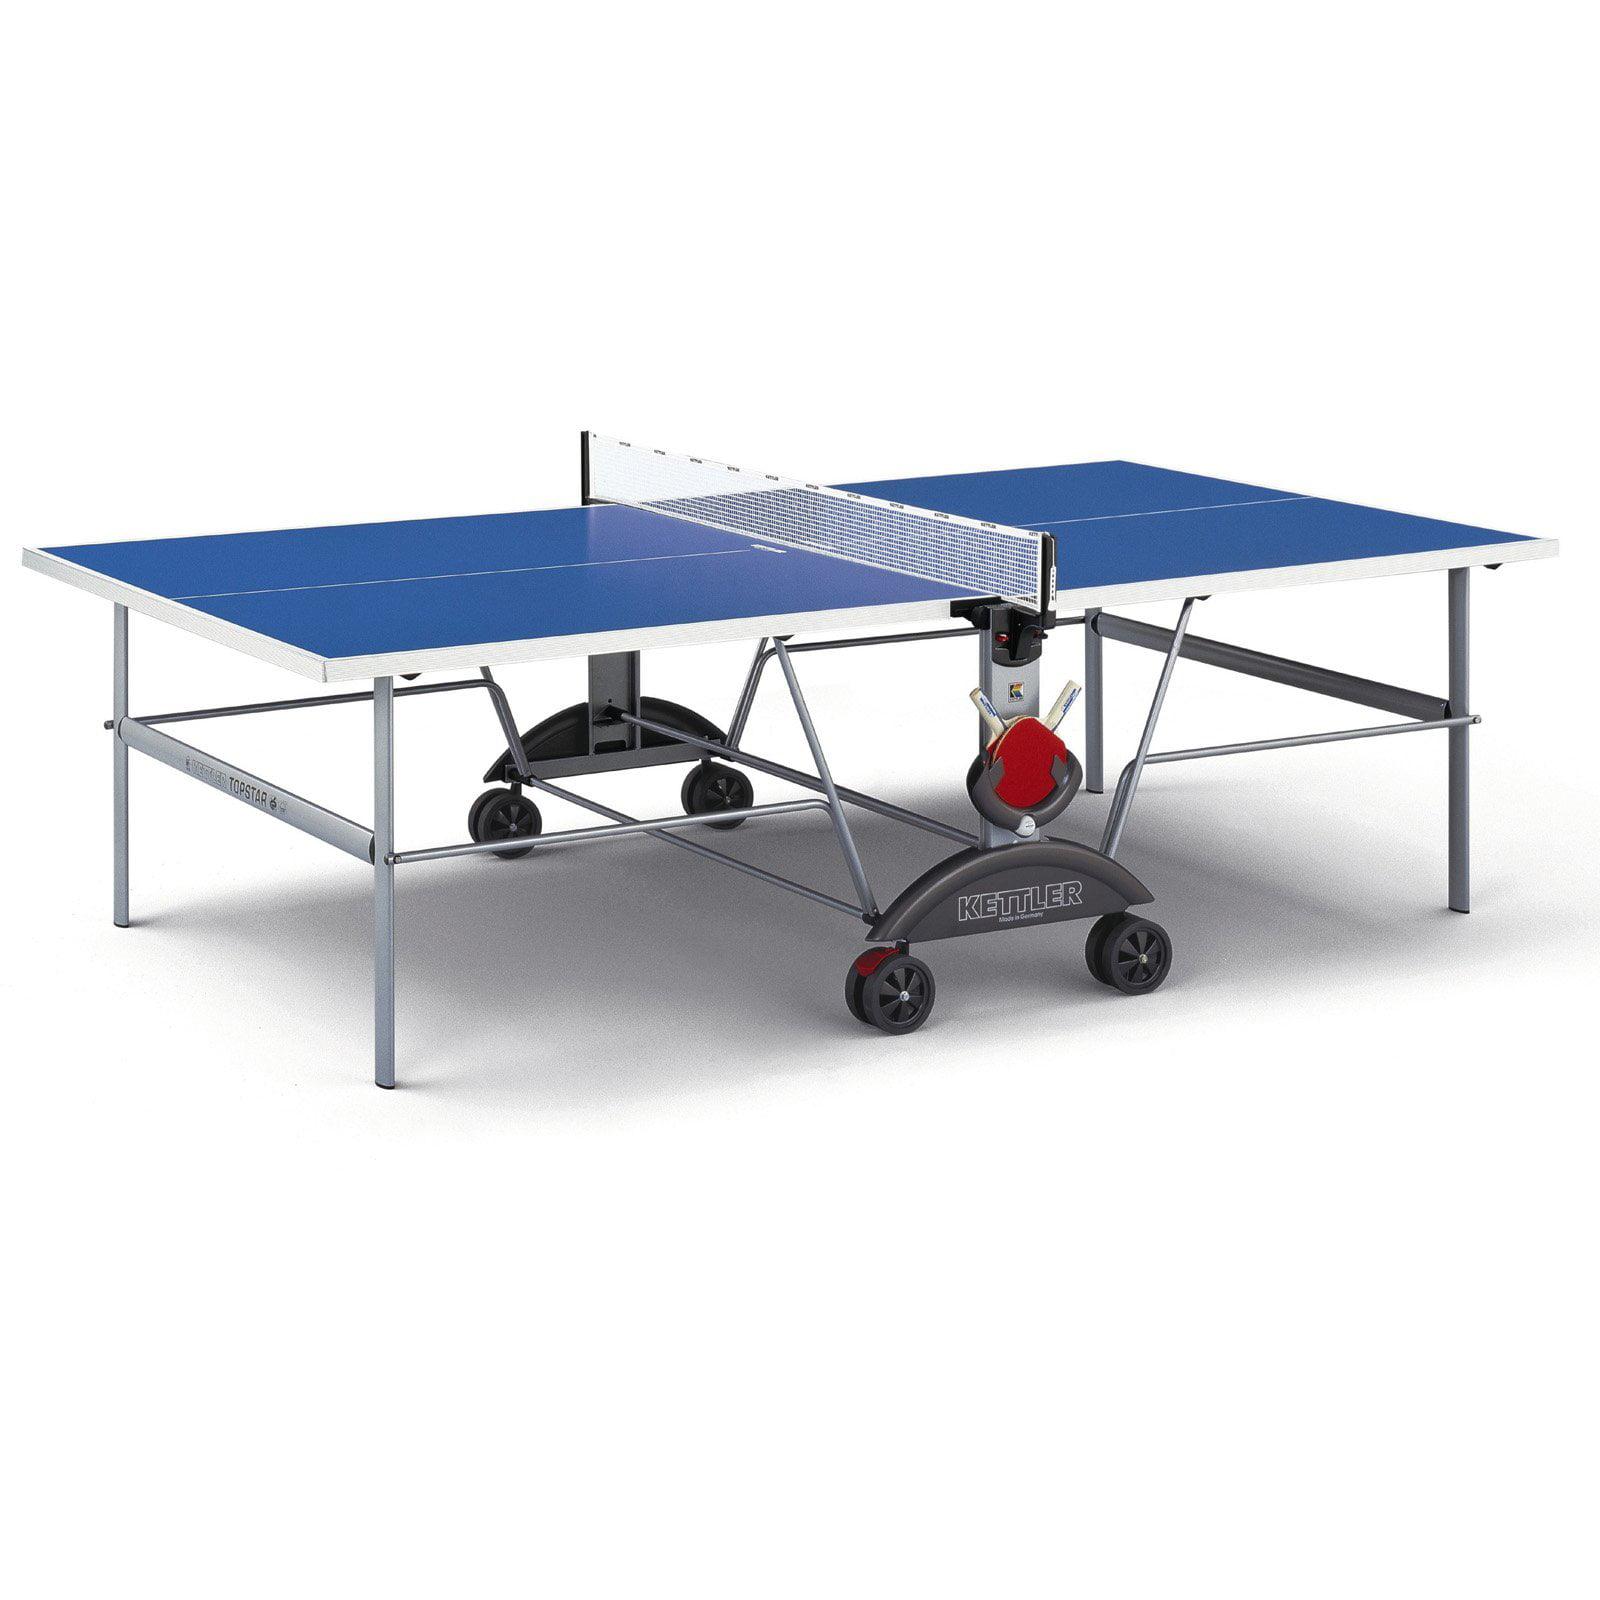 Kettler Top Star Outdoor Table Tennis Table